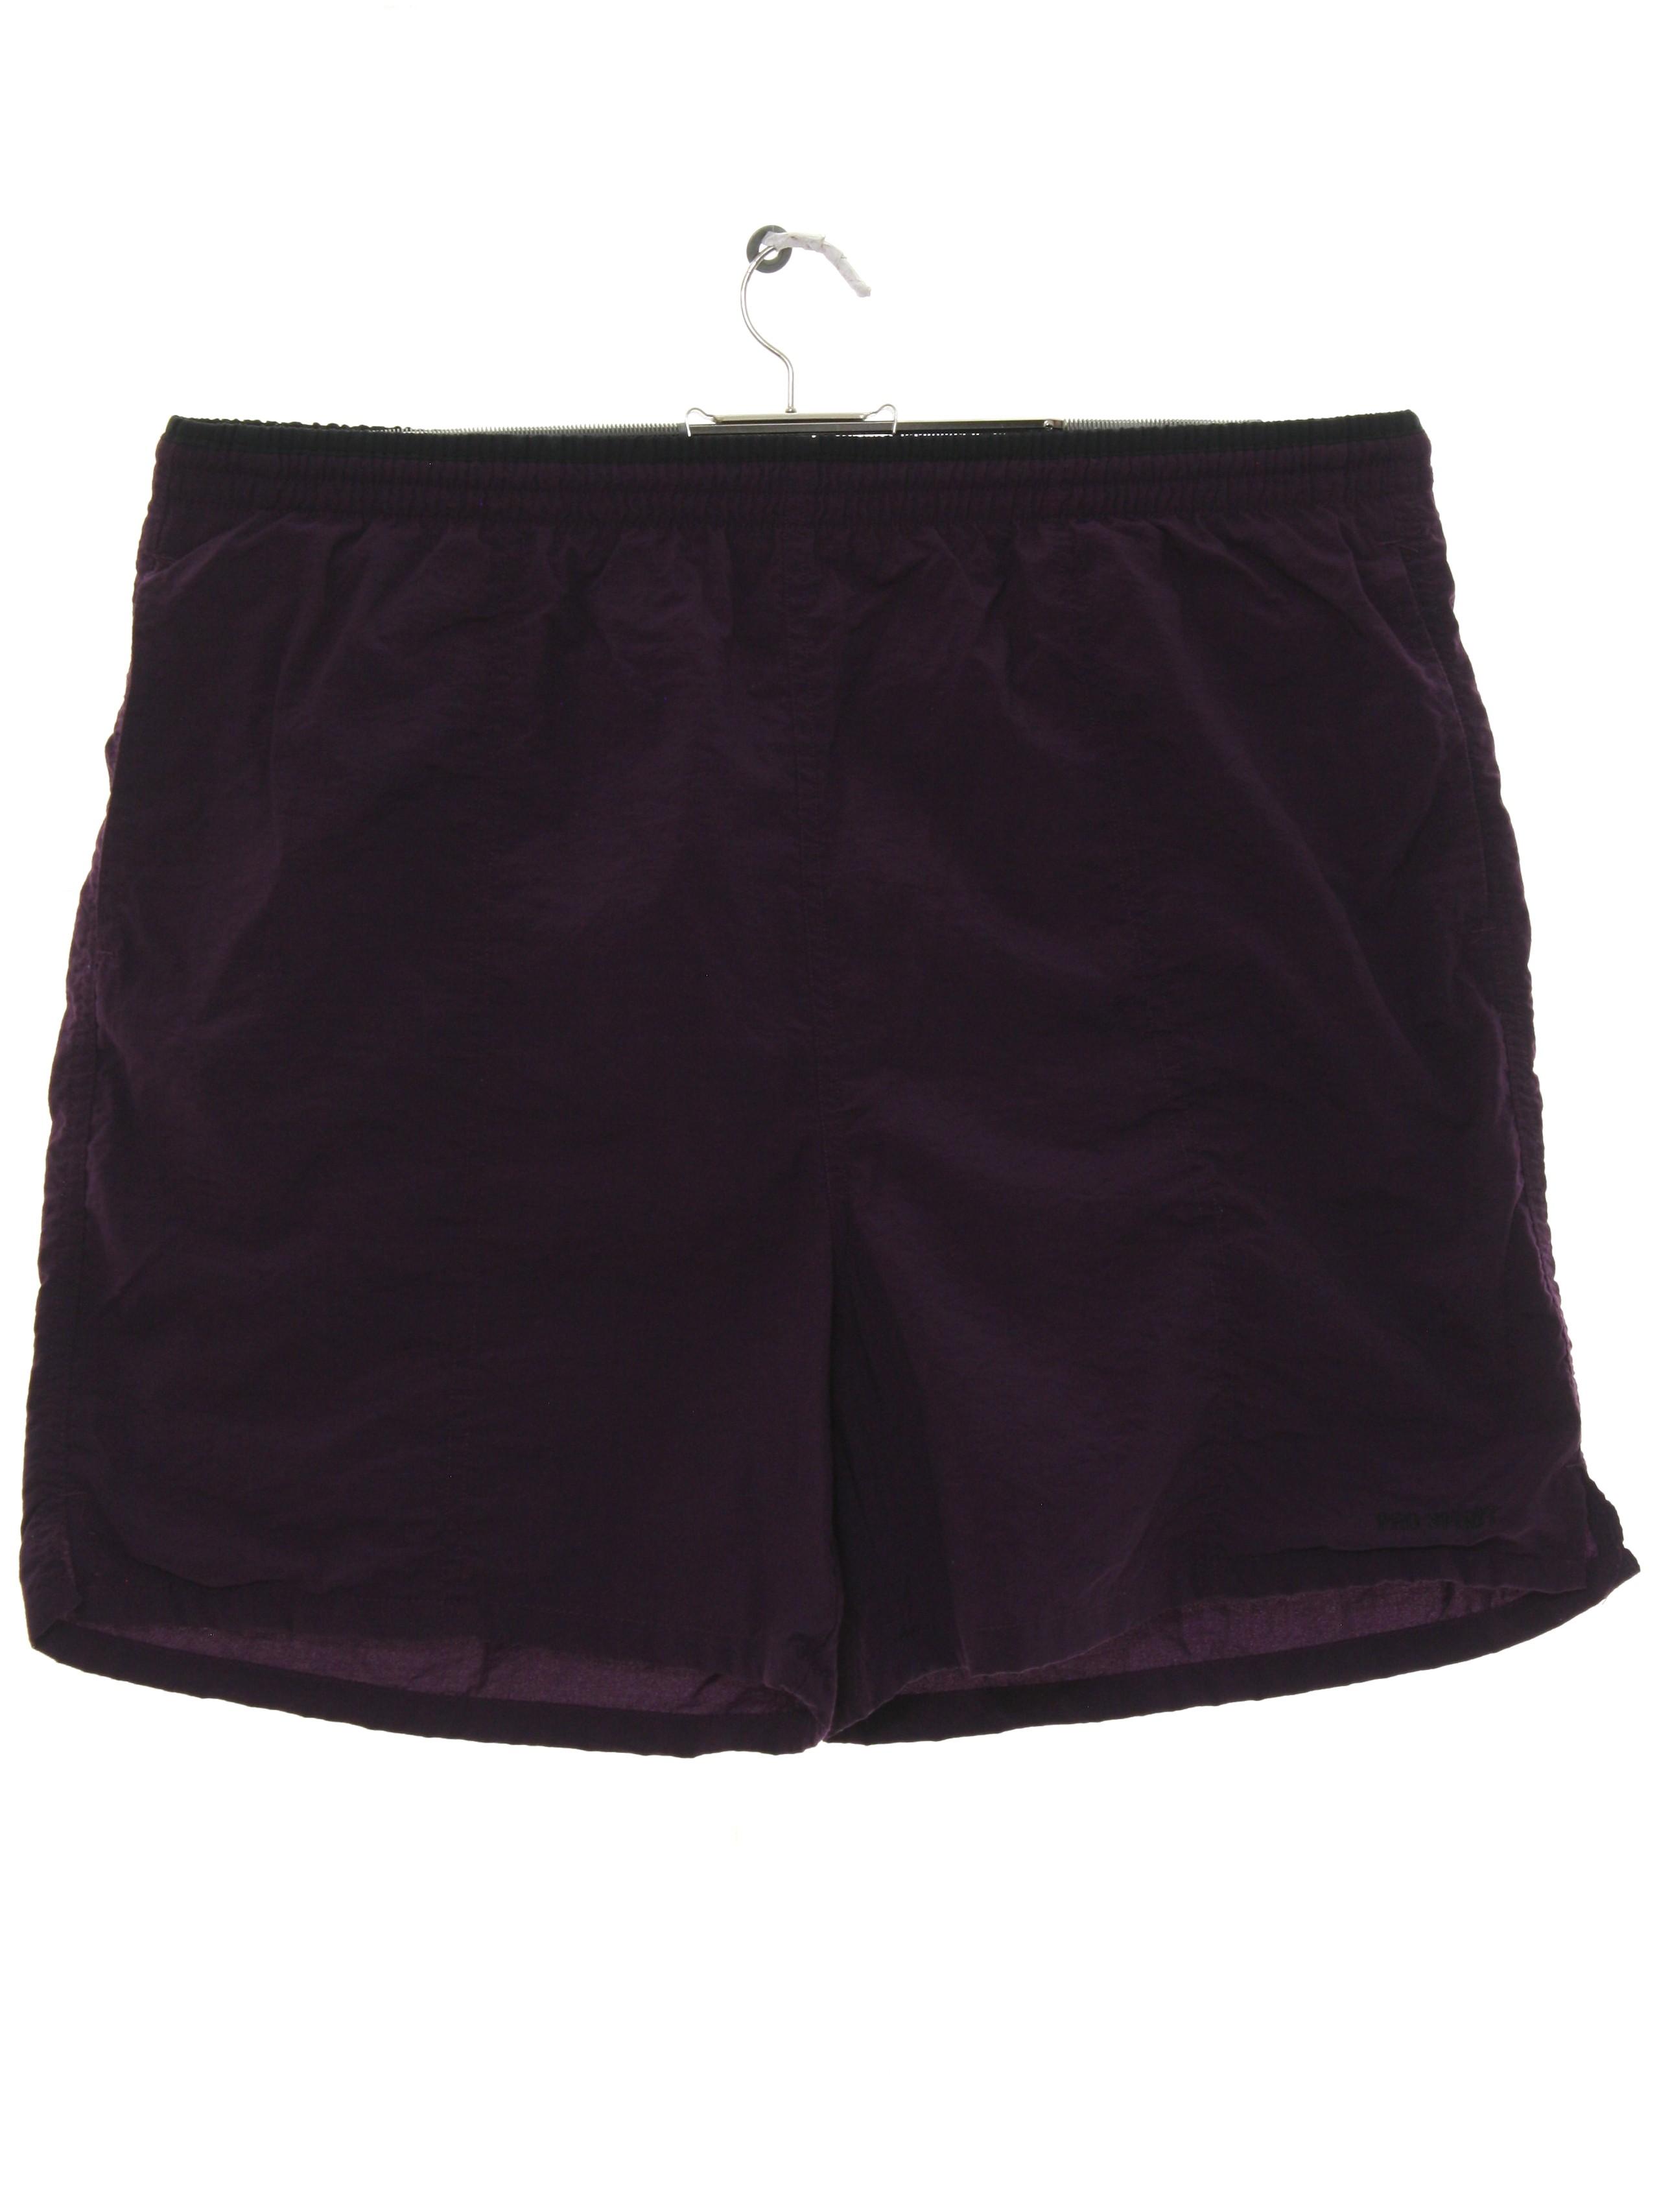 732a7de9d8 Retro 90's Swimsuit/Swimwear: 90s -Pro Spirit- Mens dark plum purple ...